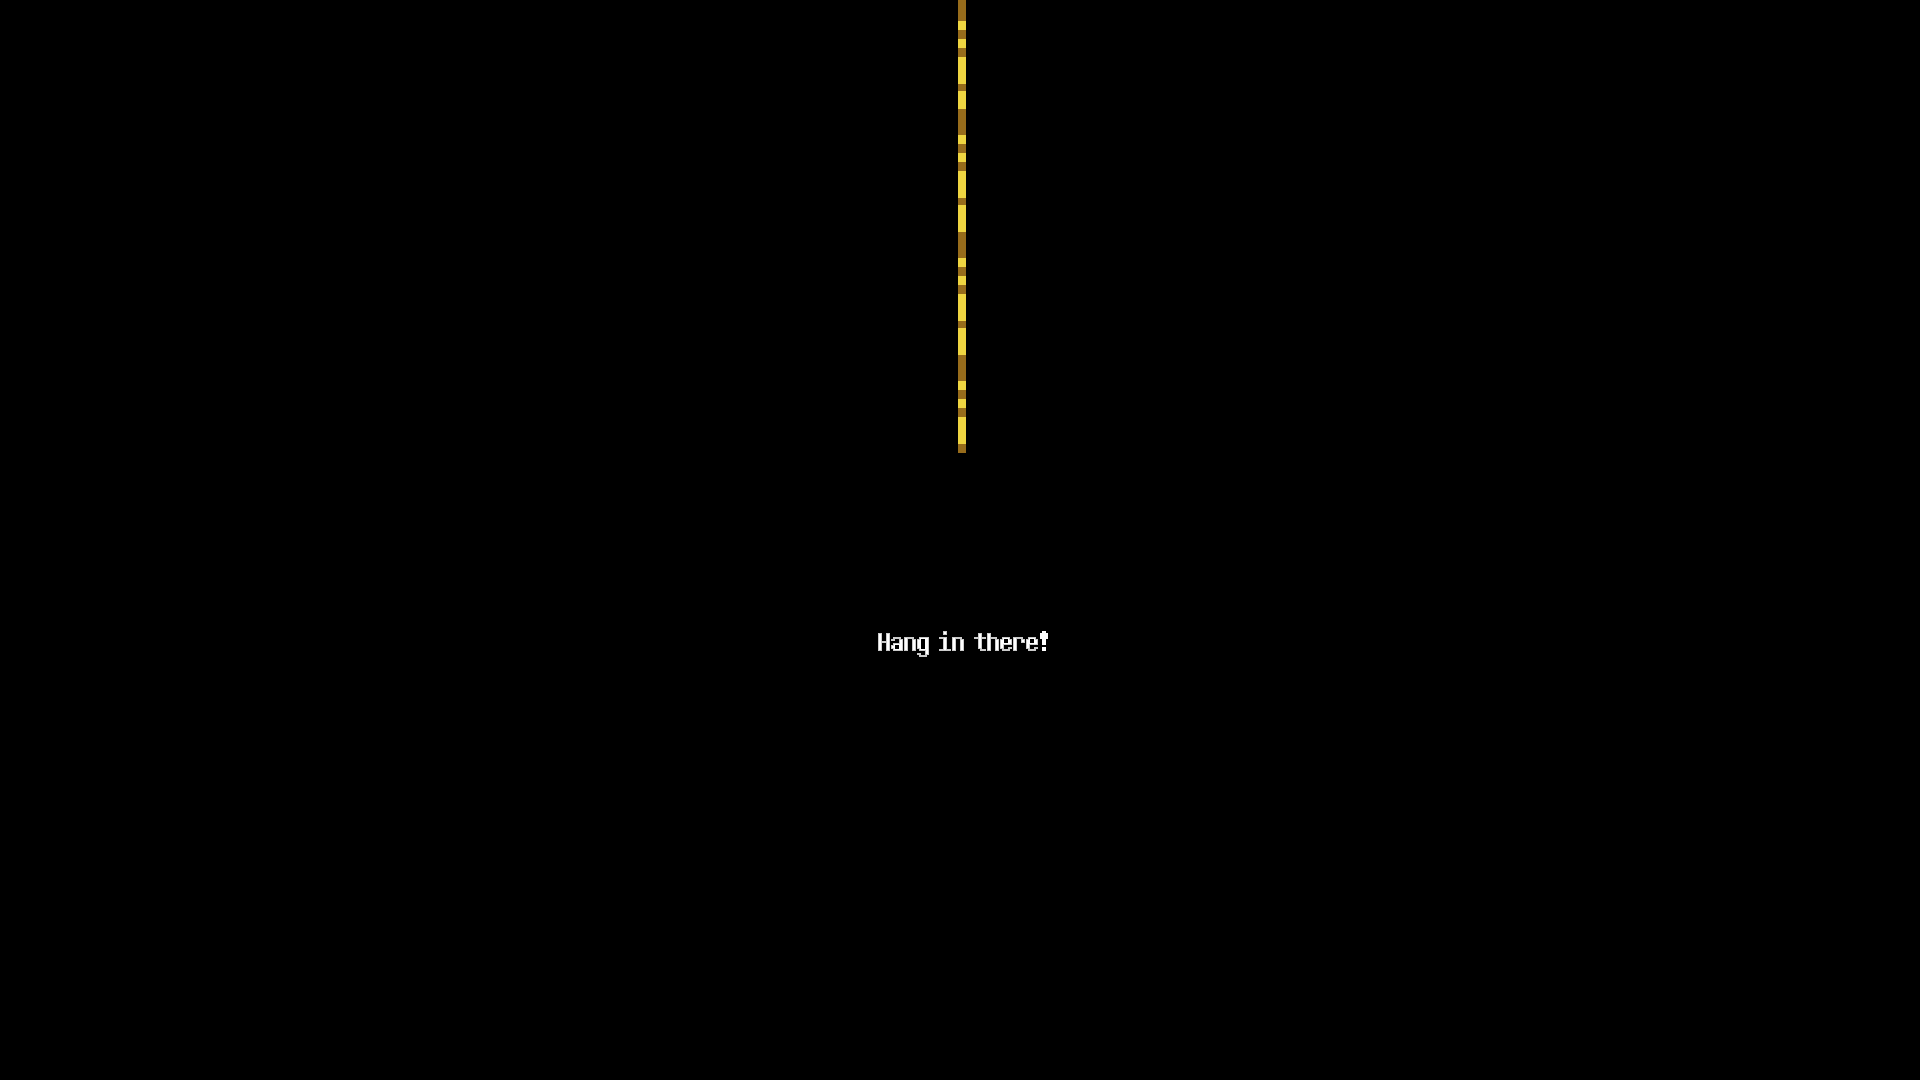 Group Of Undertale Determination Iphone Wallpaper